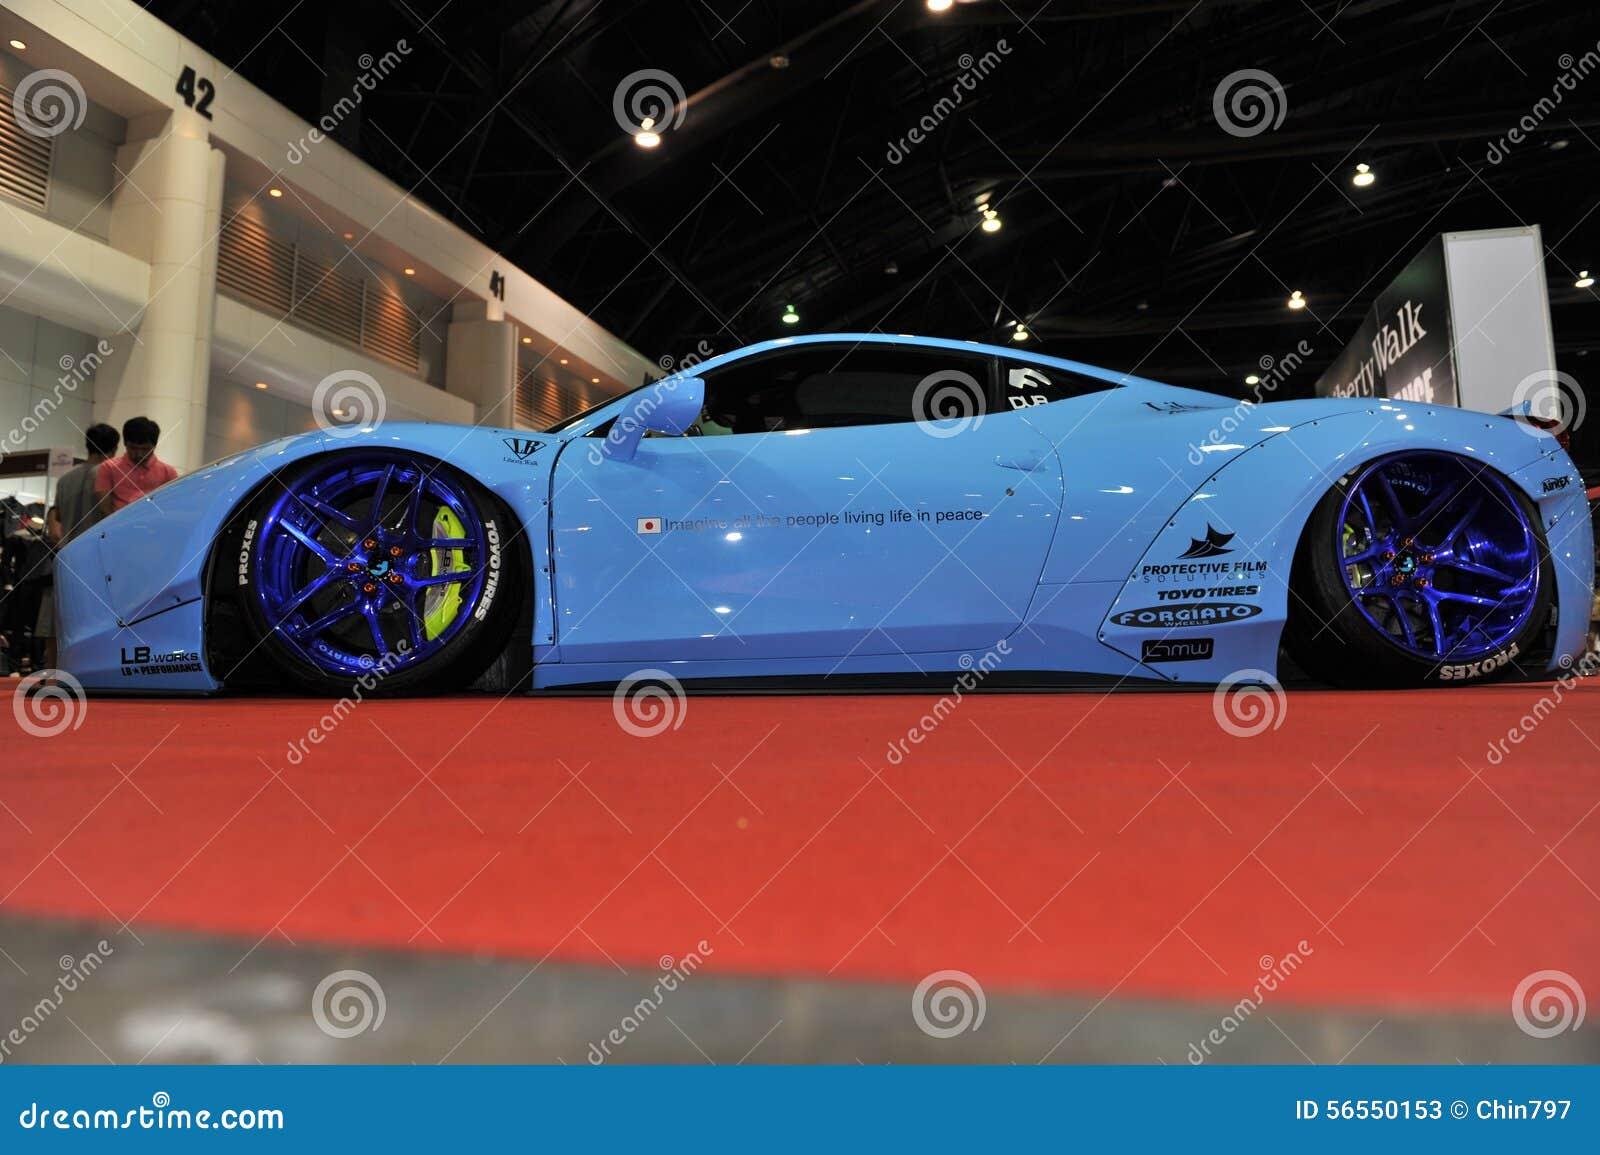 Download Αυτοκίνητο Lamborghini στο 3$ο διεθνές Autosalon 2015 της Μπανγκόκ στις 27 Ιουνίου 2015 στη Μπανγκόκ, Ταϊλάνδη Εκδοτική Στοκ Εικόνες - εικόνα από γεγονός, χαριτωμένος: 56550153